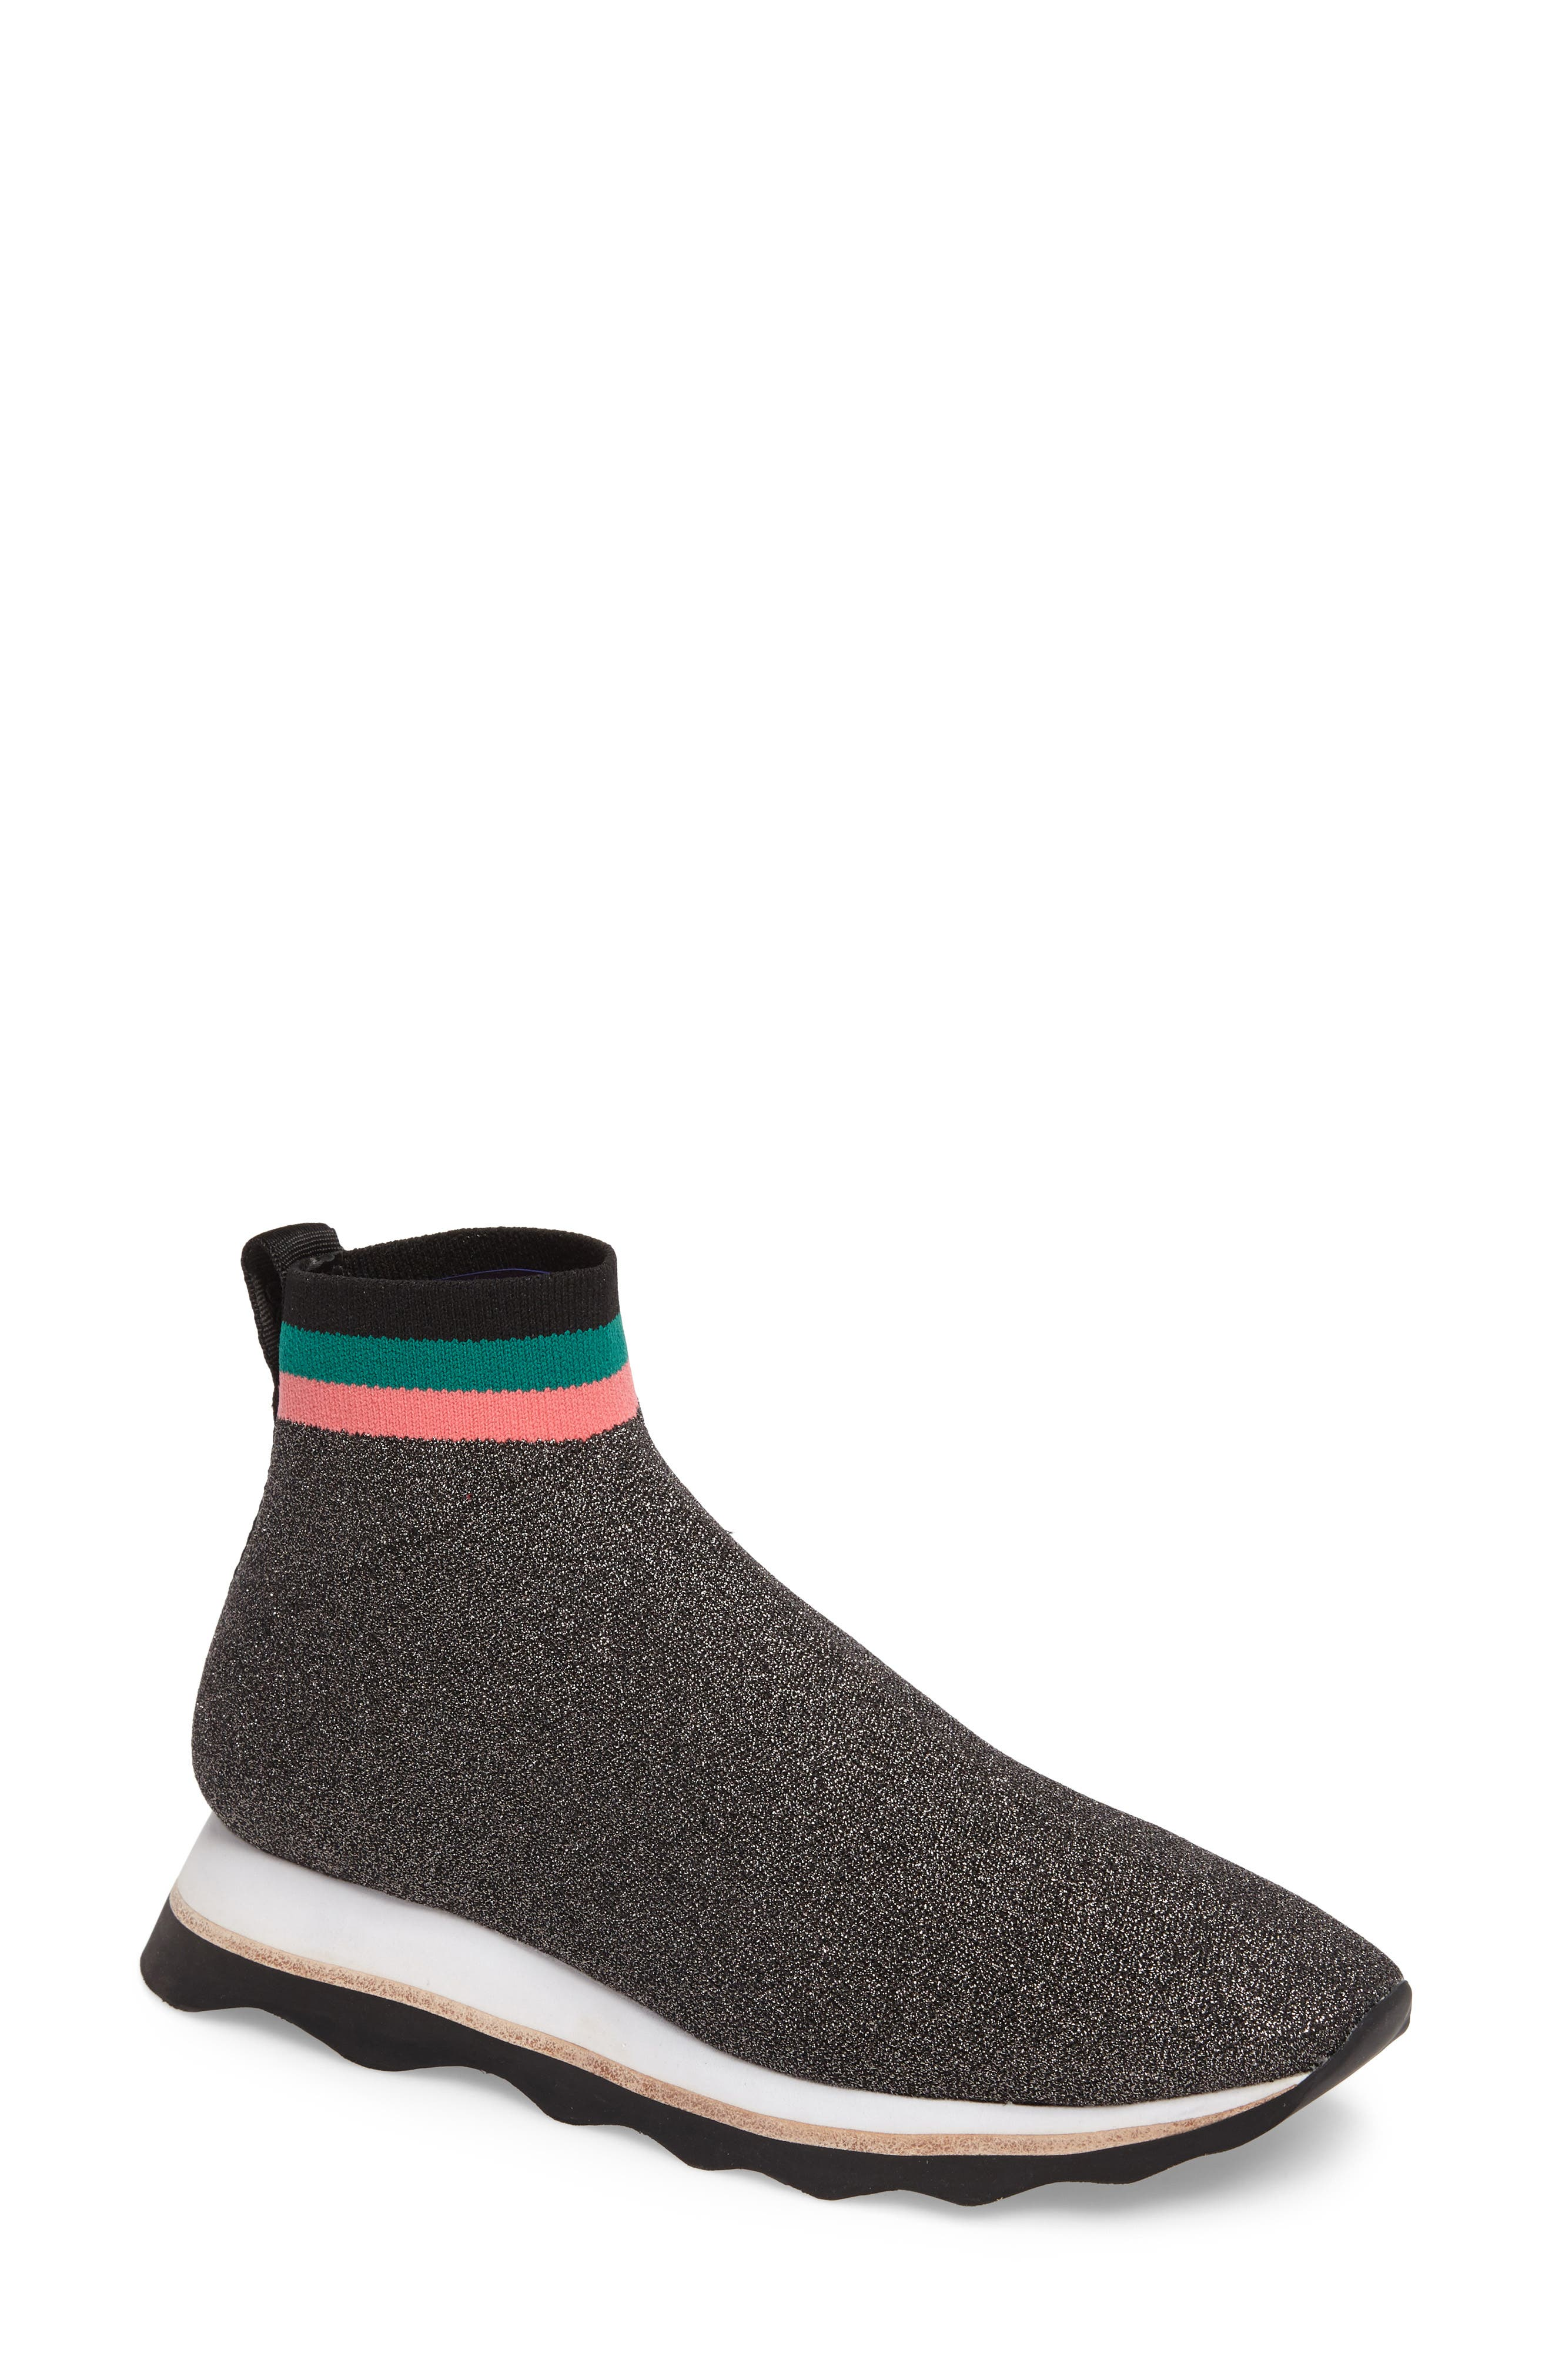 Scout Sock Sneaker,                         Main,                         color, 002